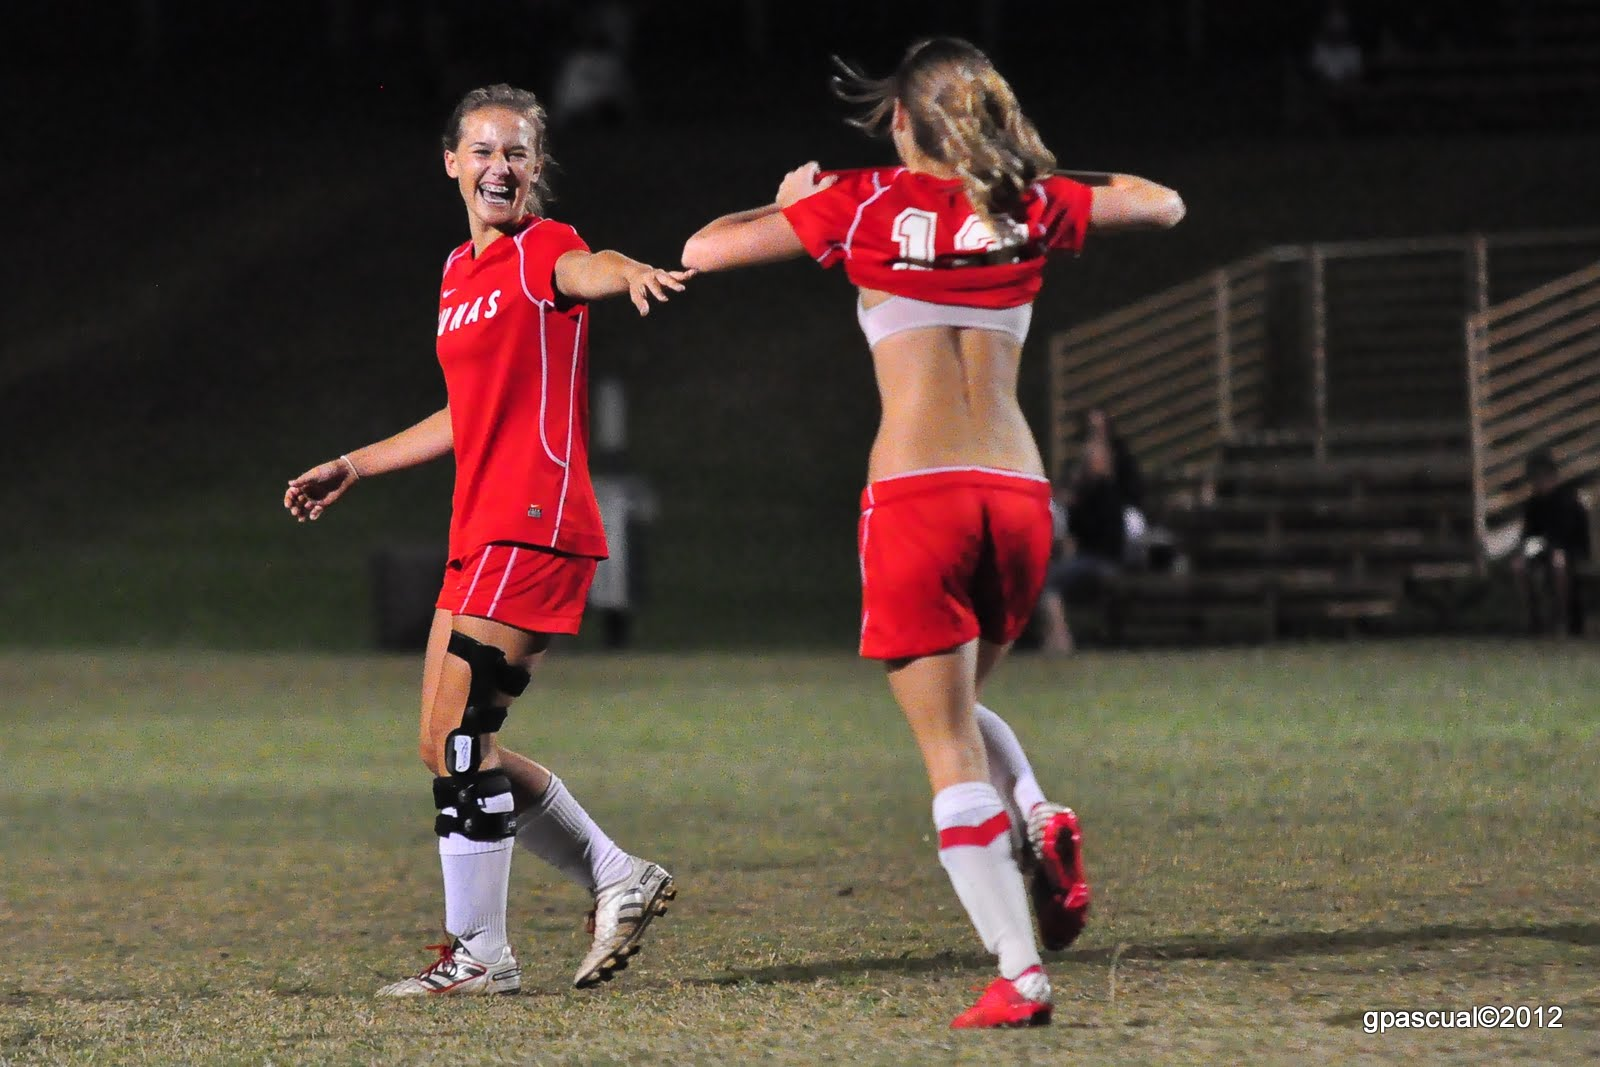 Brandi chastain soccer ball talented phrase